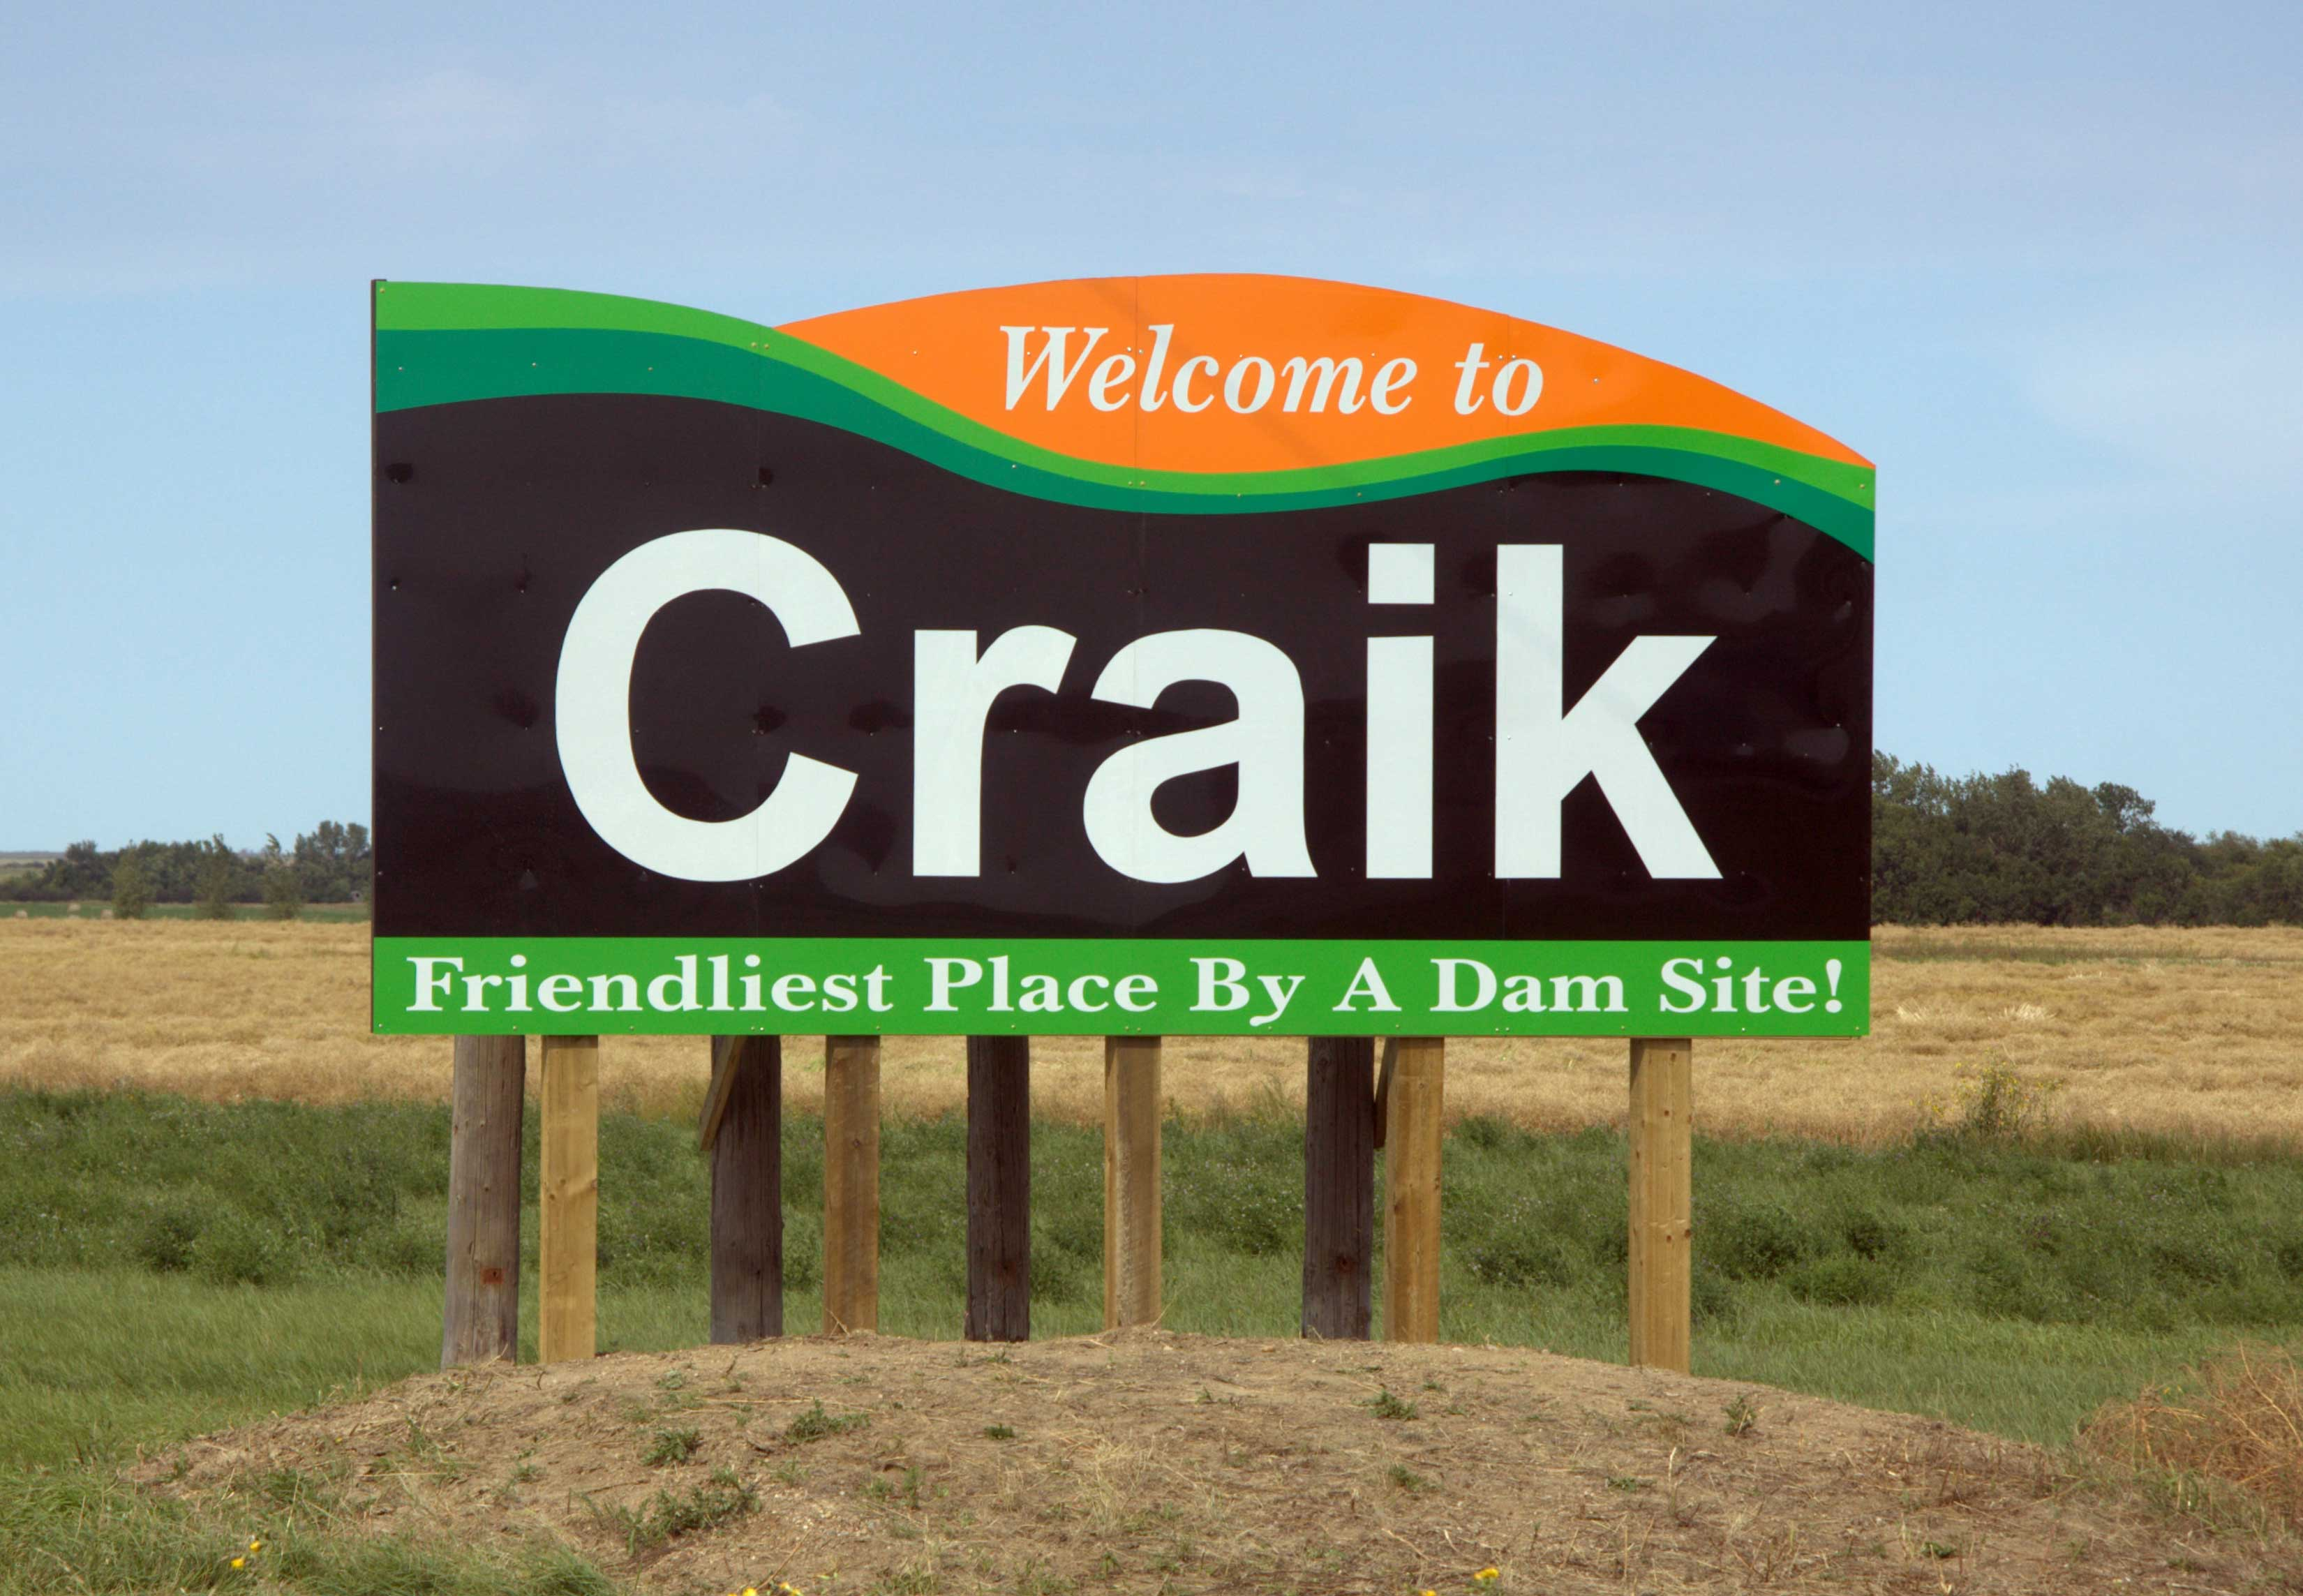 craik veneer company case